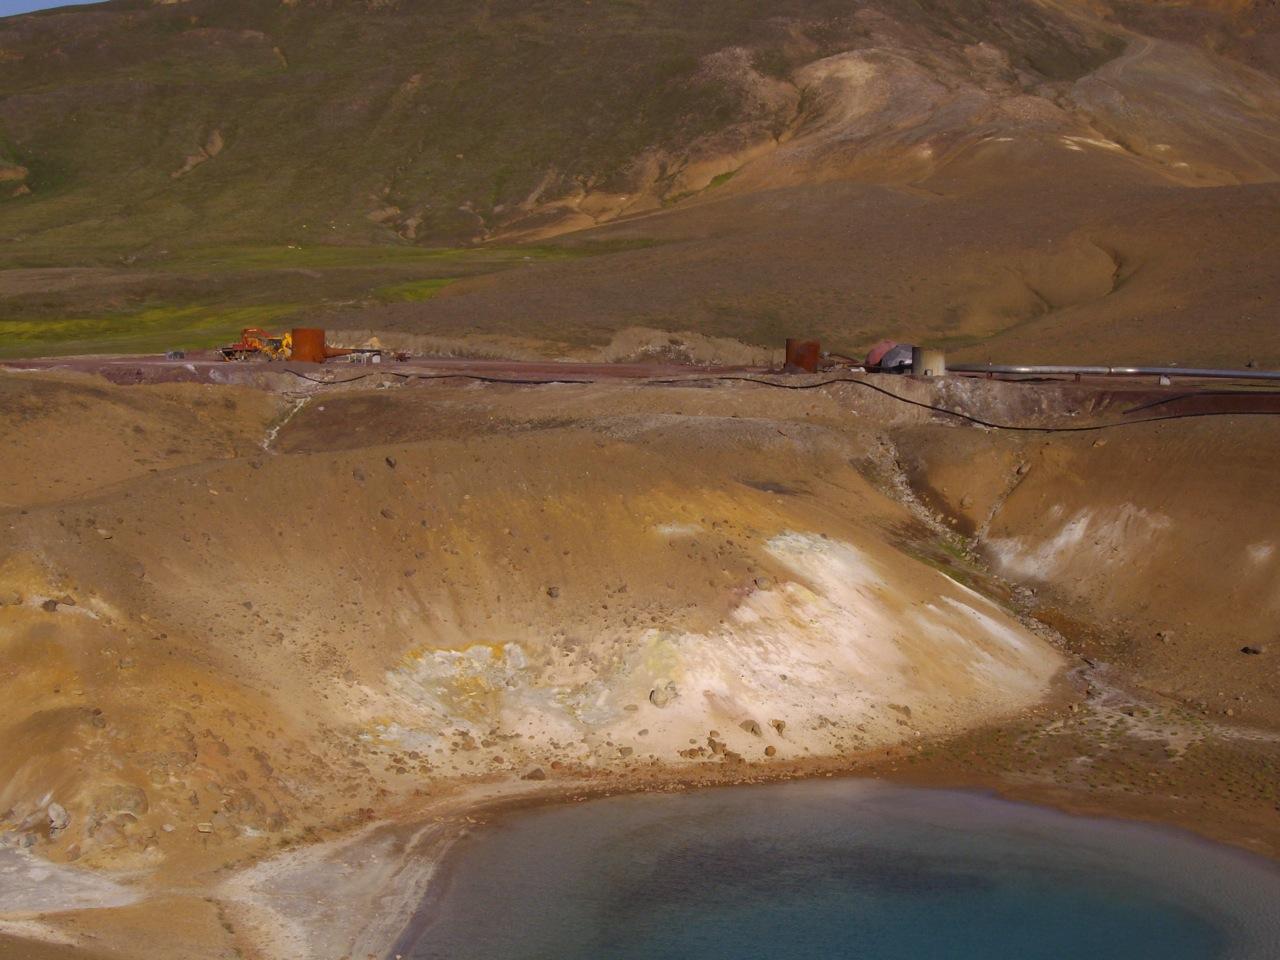 Drilling on the Viti crater edge